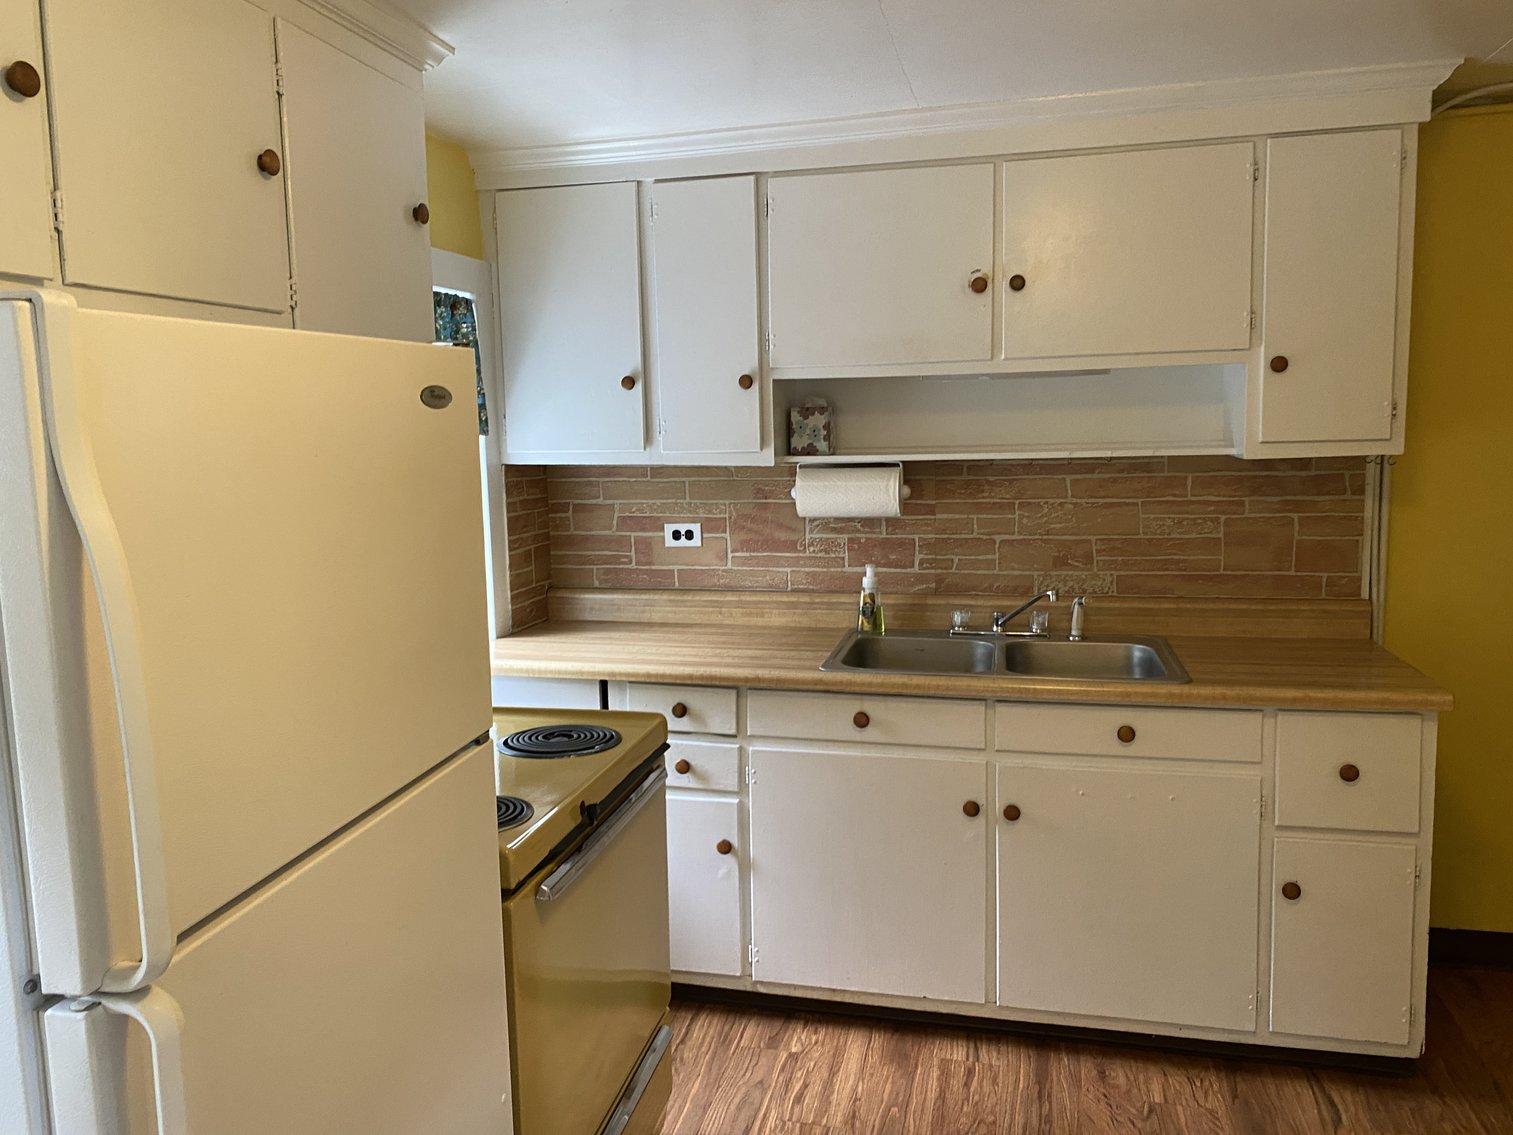 Image for 3 BR/2 BA Home on 2.4 +/- Acres in Orange County, VA